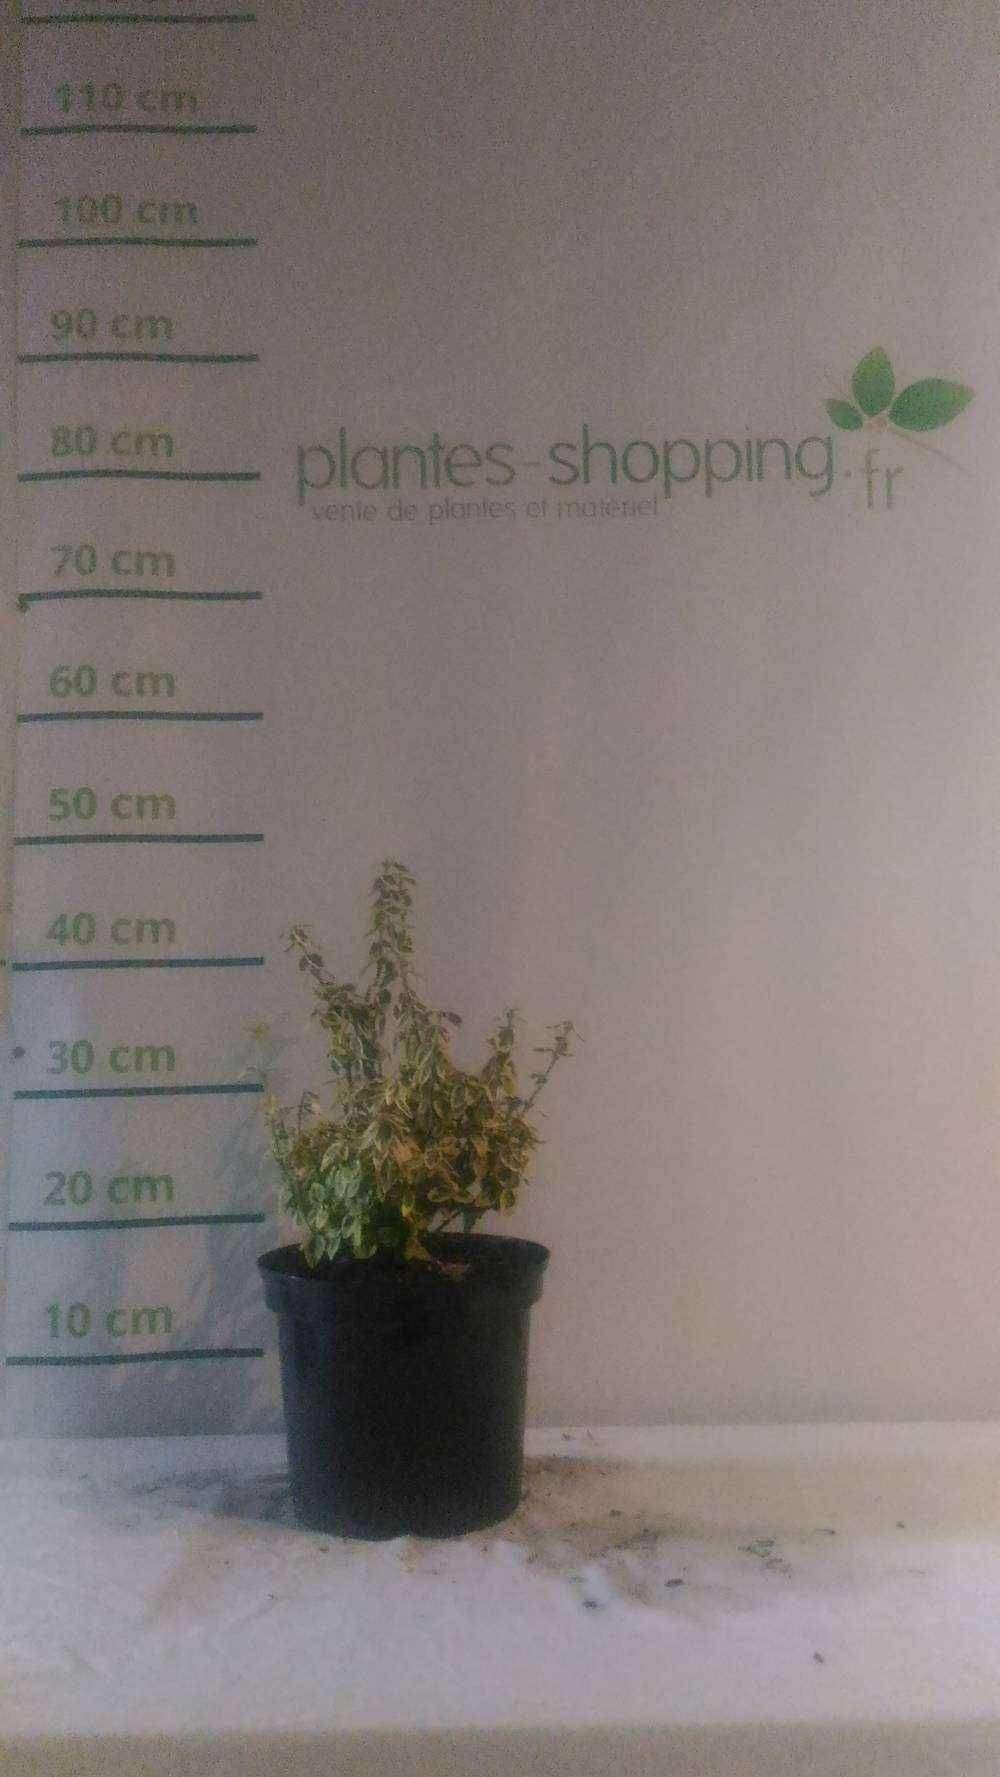 Staphylea colchica plantes ext rieures for Plantes a commander